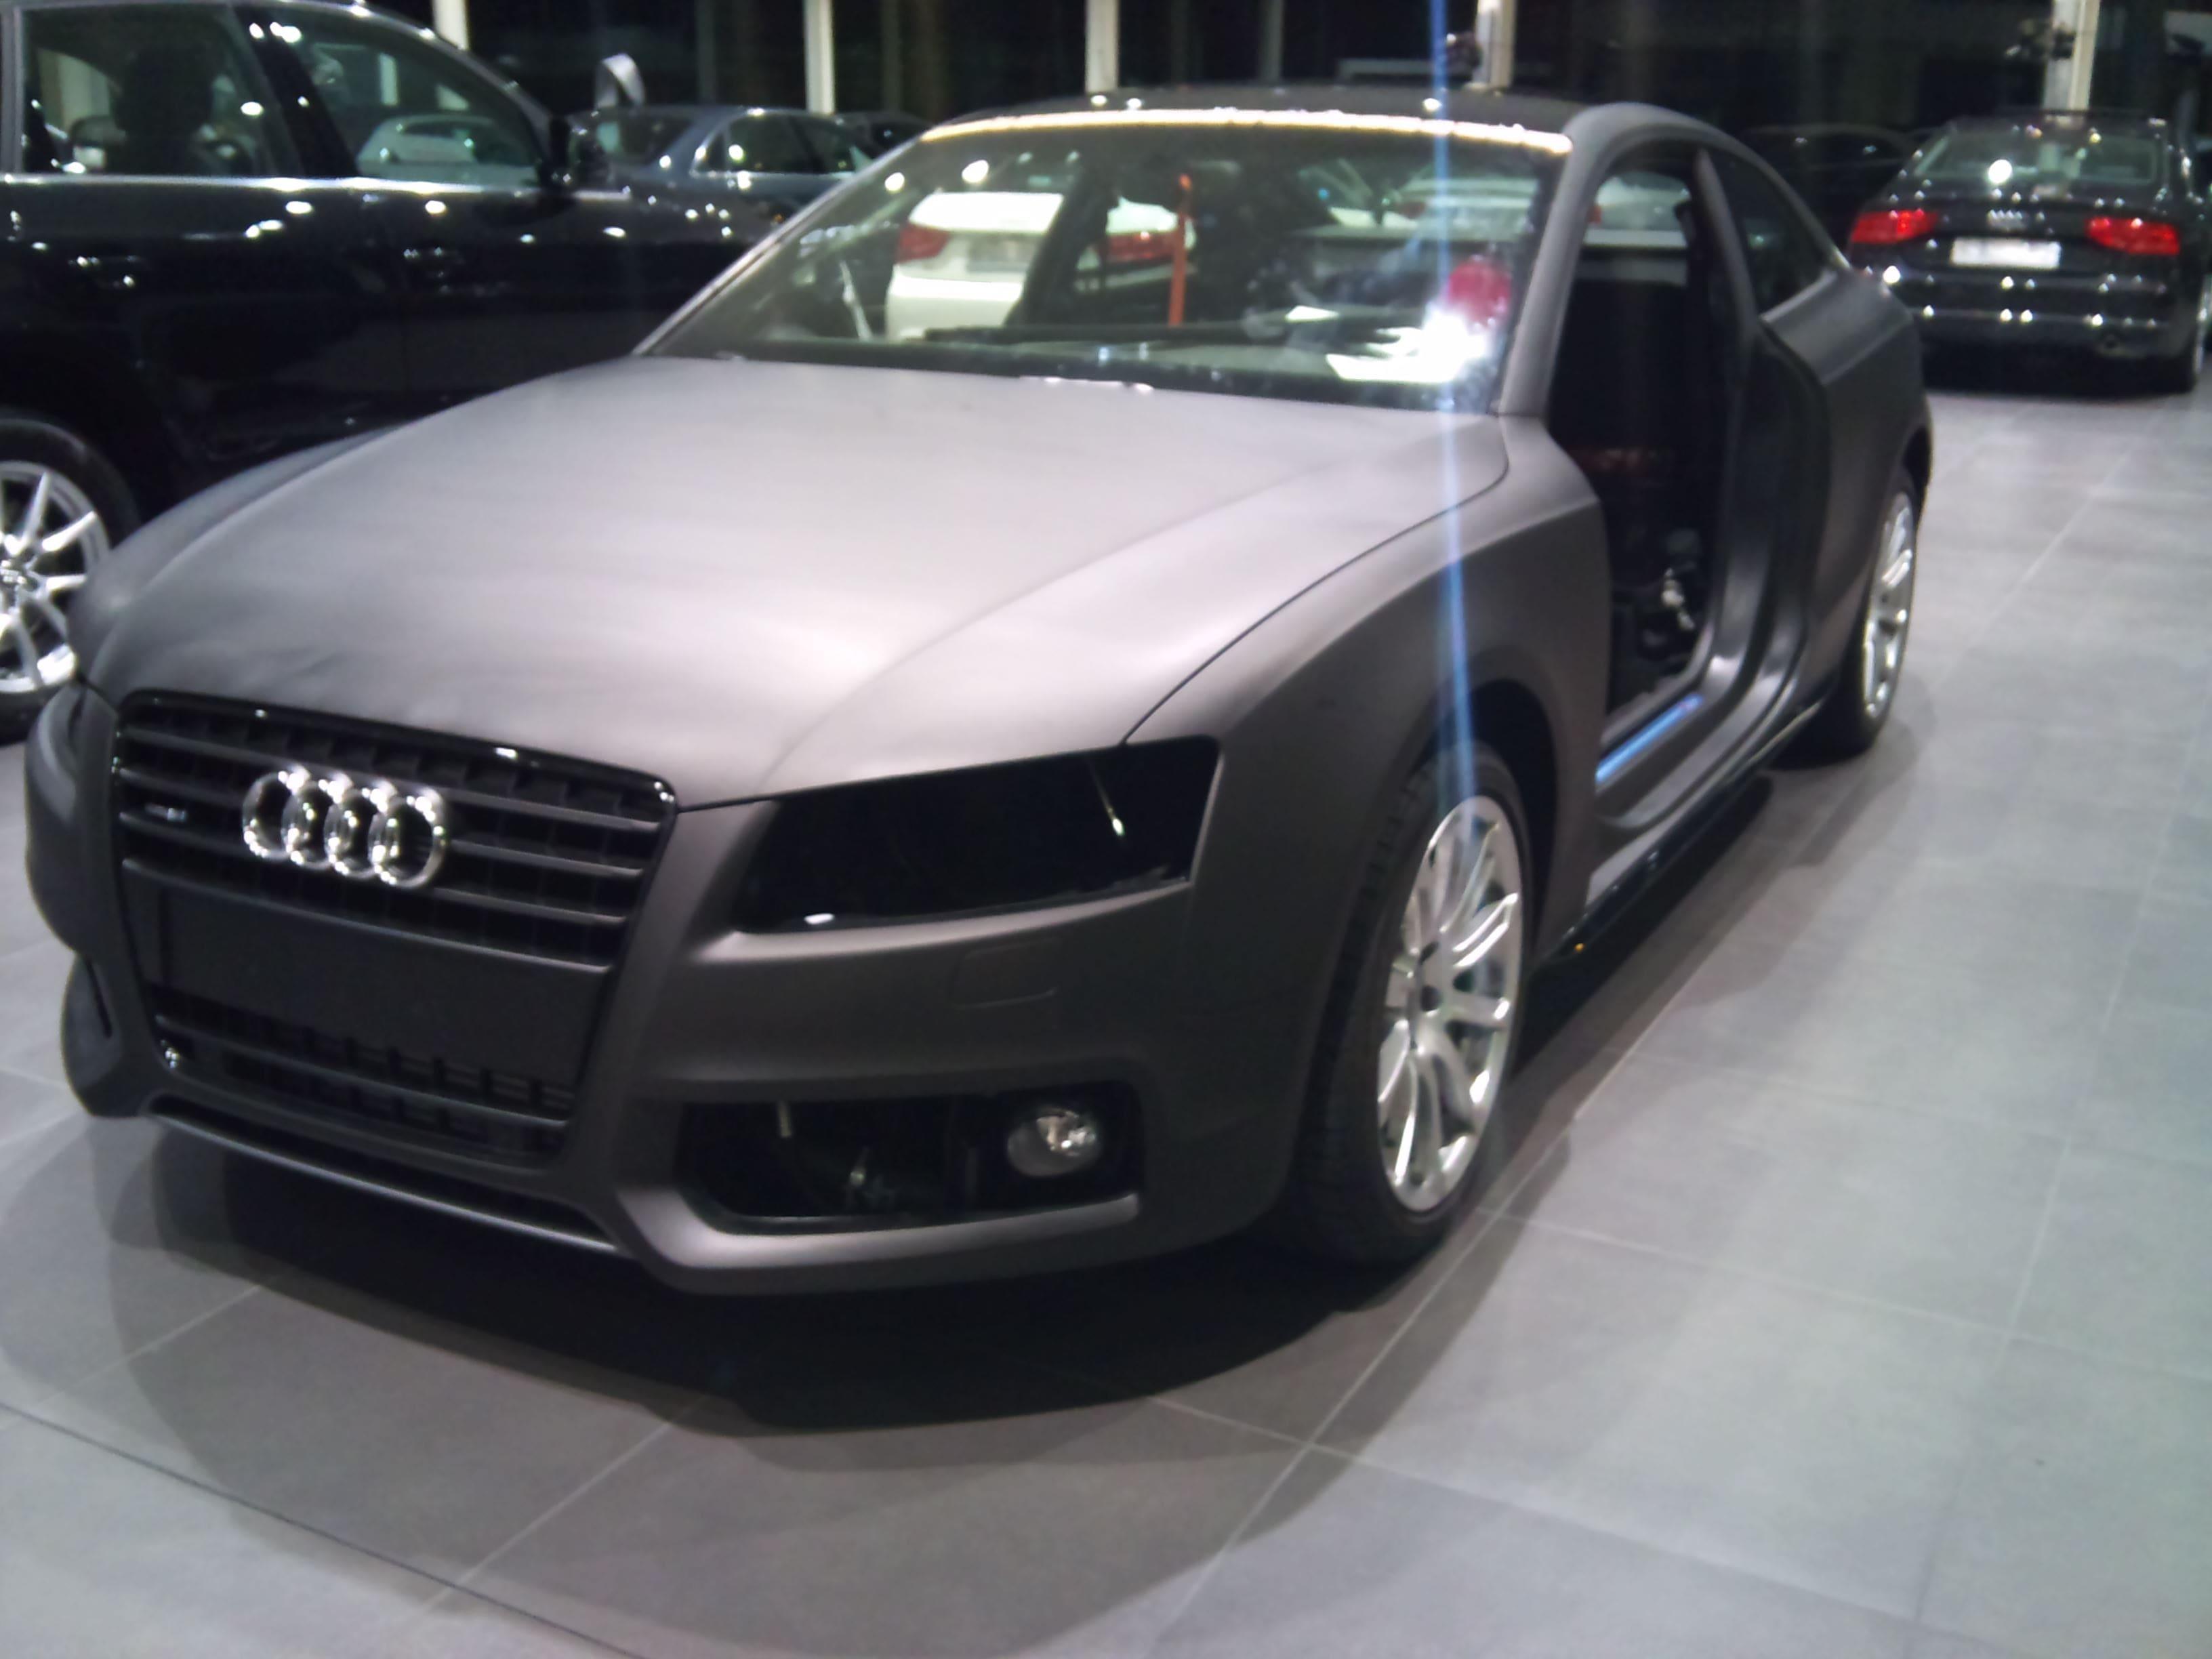 Audi A5 Coupe met Mat Zwarte Wrap, Carwrapping door Wrapmyride.nu Foto-nr:4562, ©2021